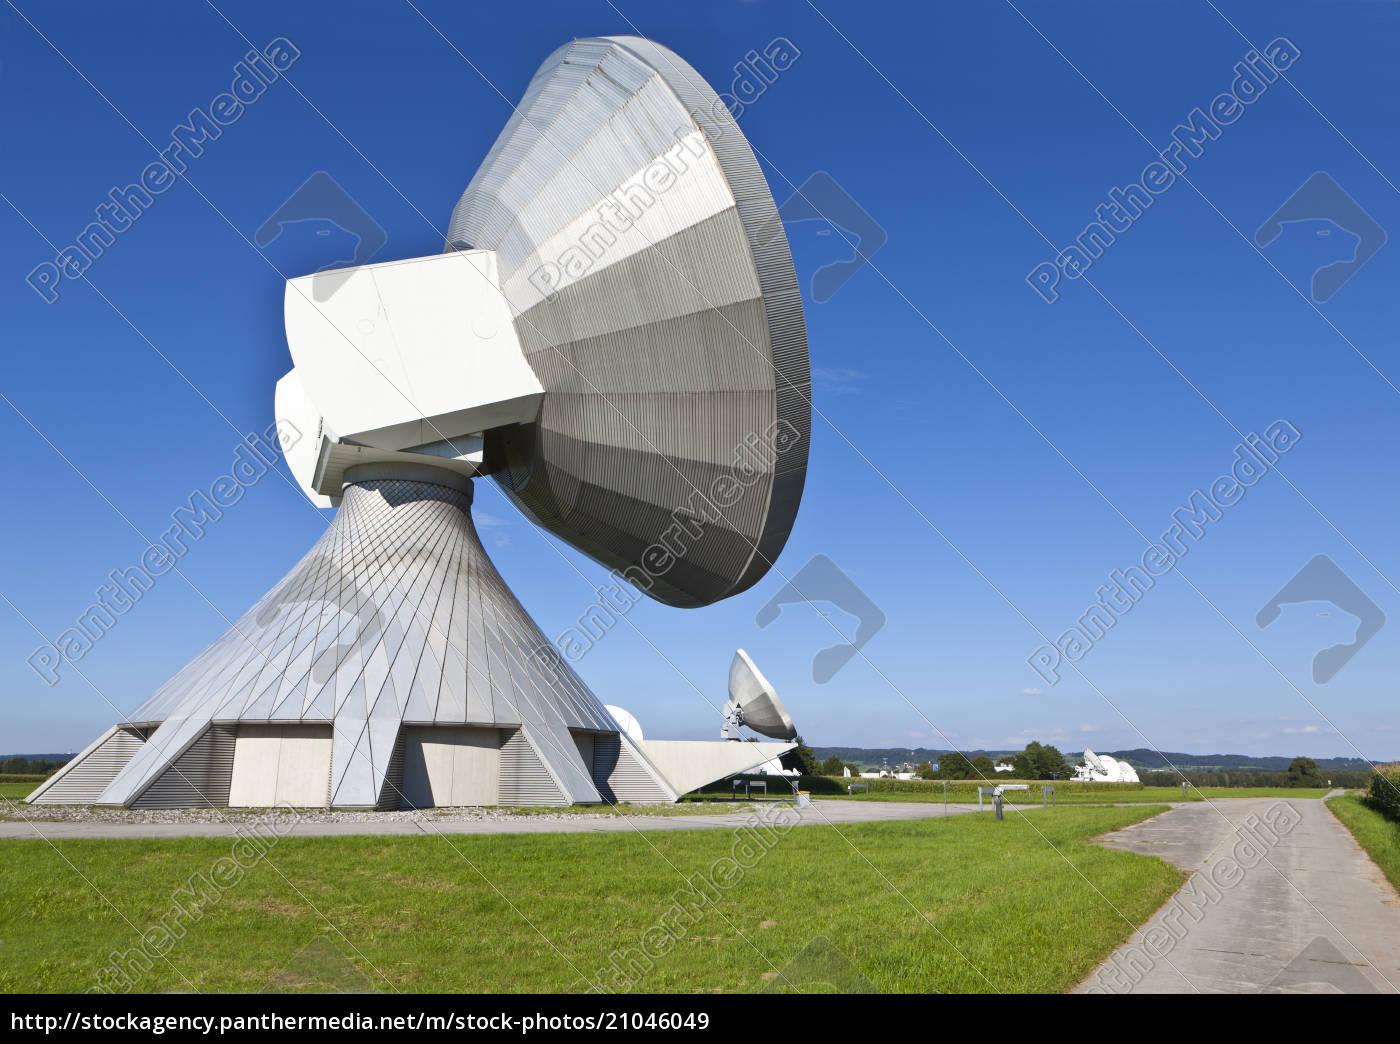 niemcy, bawaria, widok, na, dania, satelitarne - 21046049